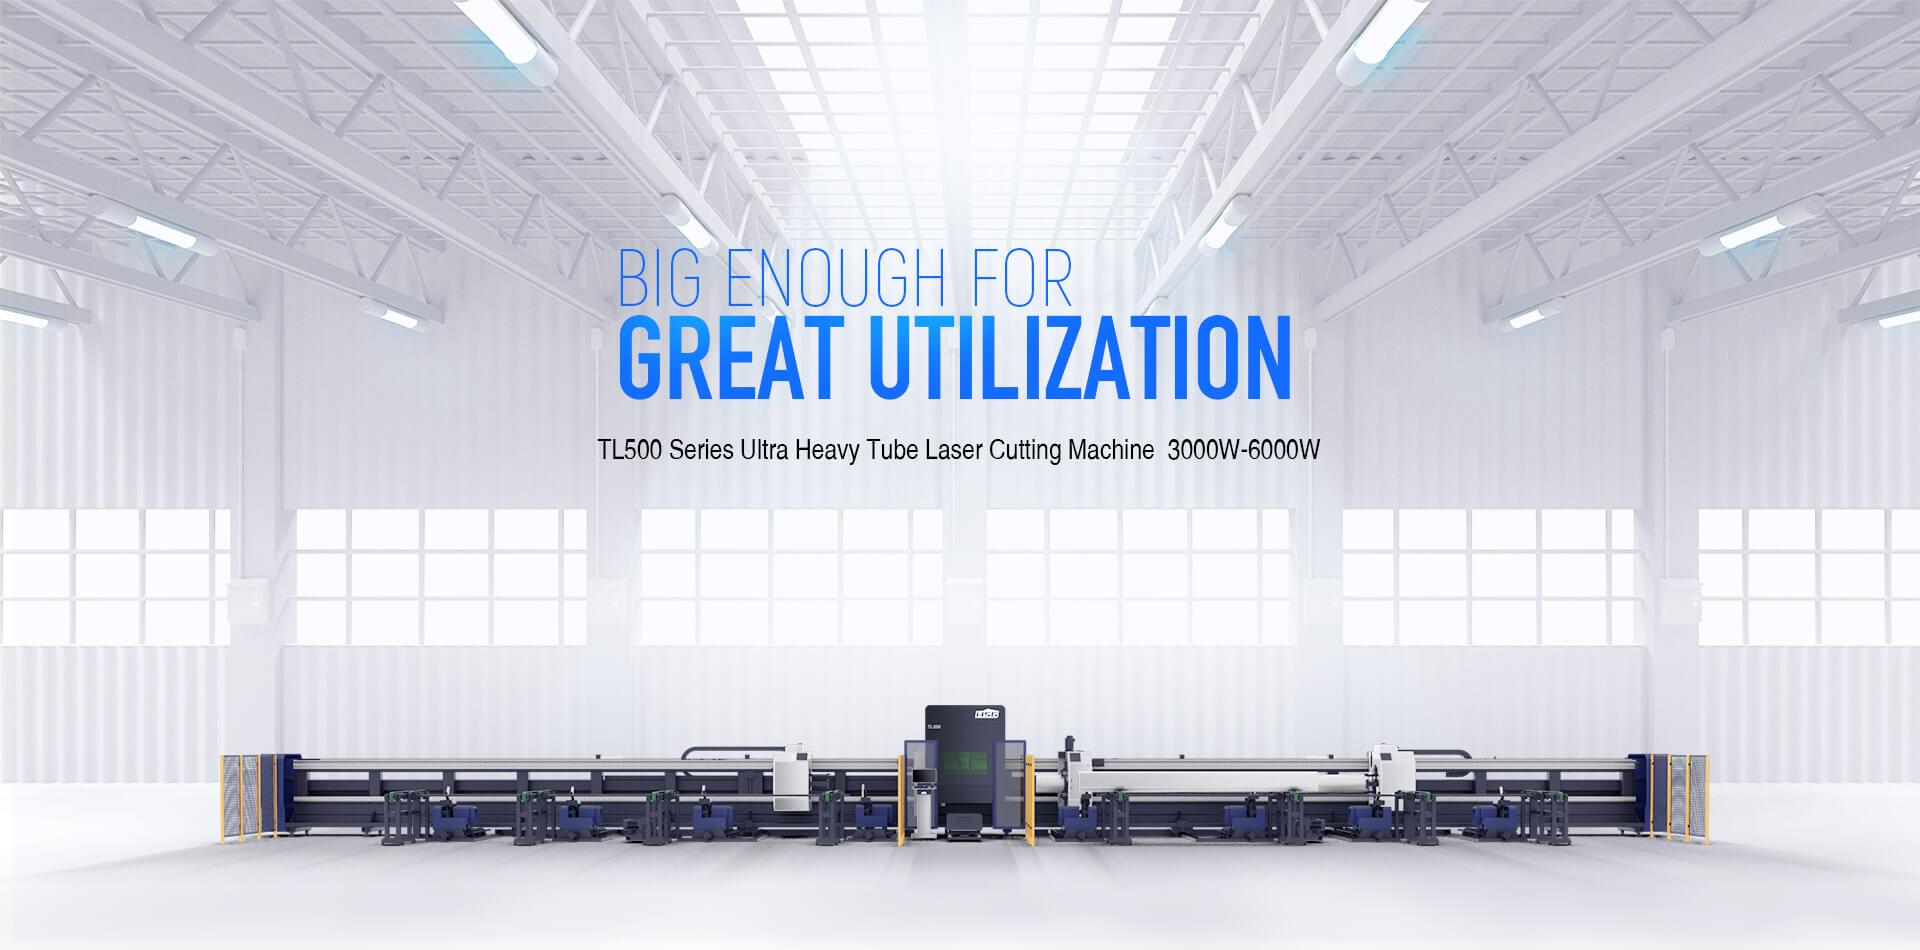 TL500 Series Ultra Heavy Tube Laser Cutting Machine